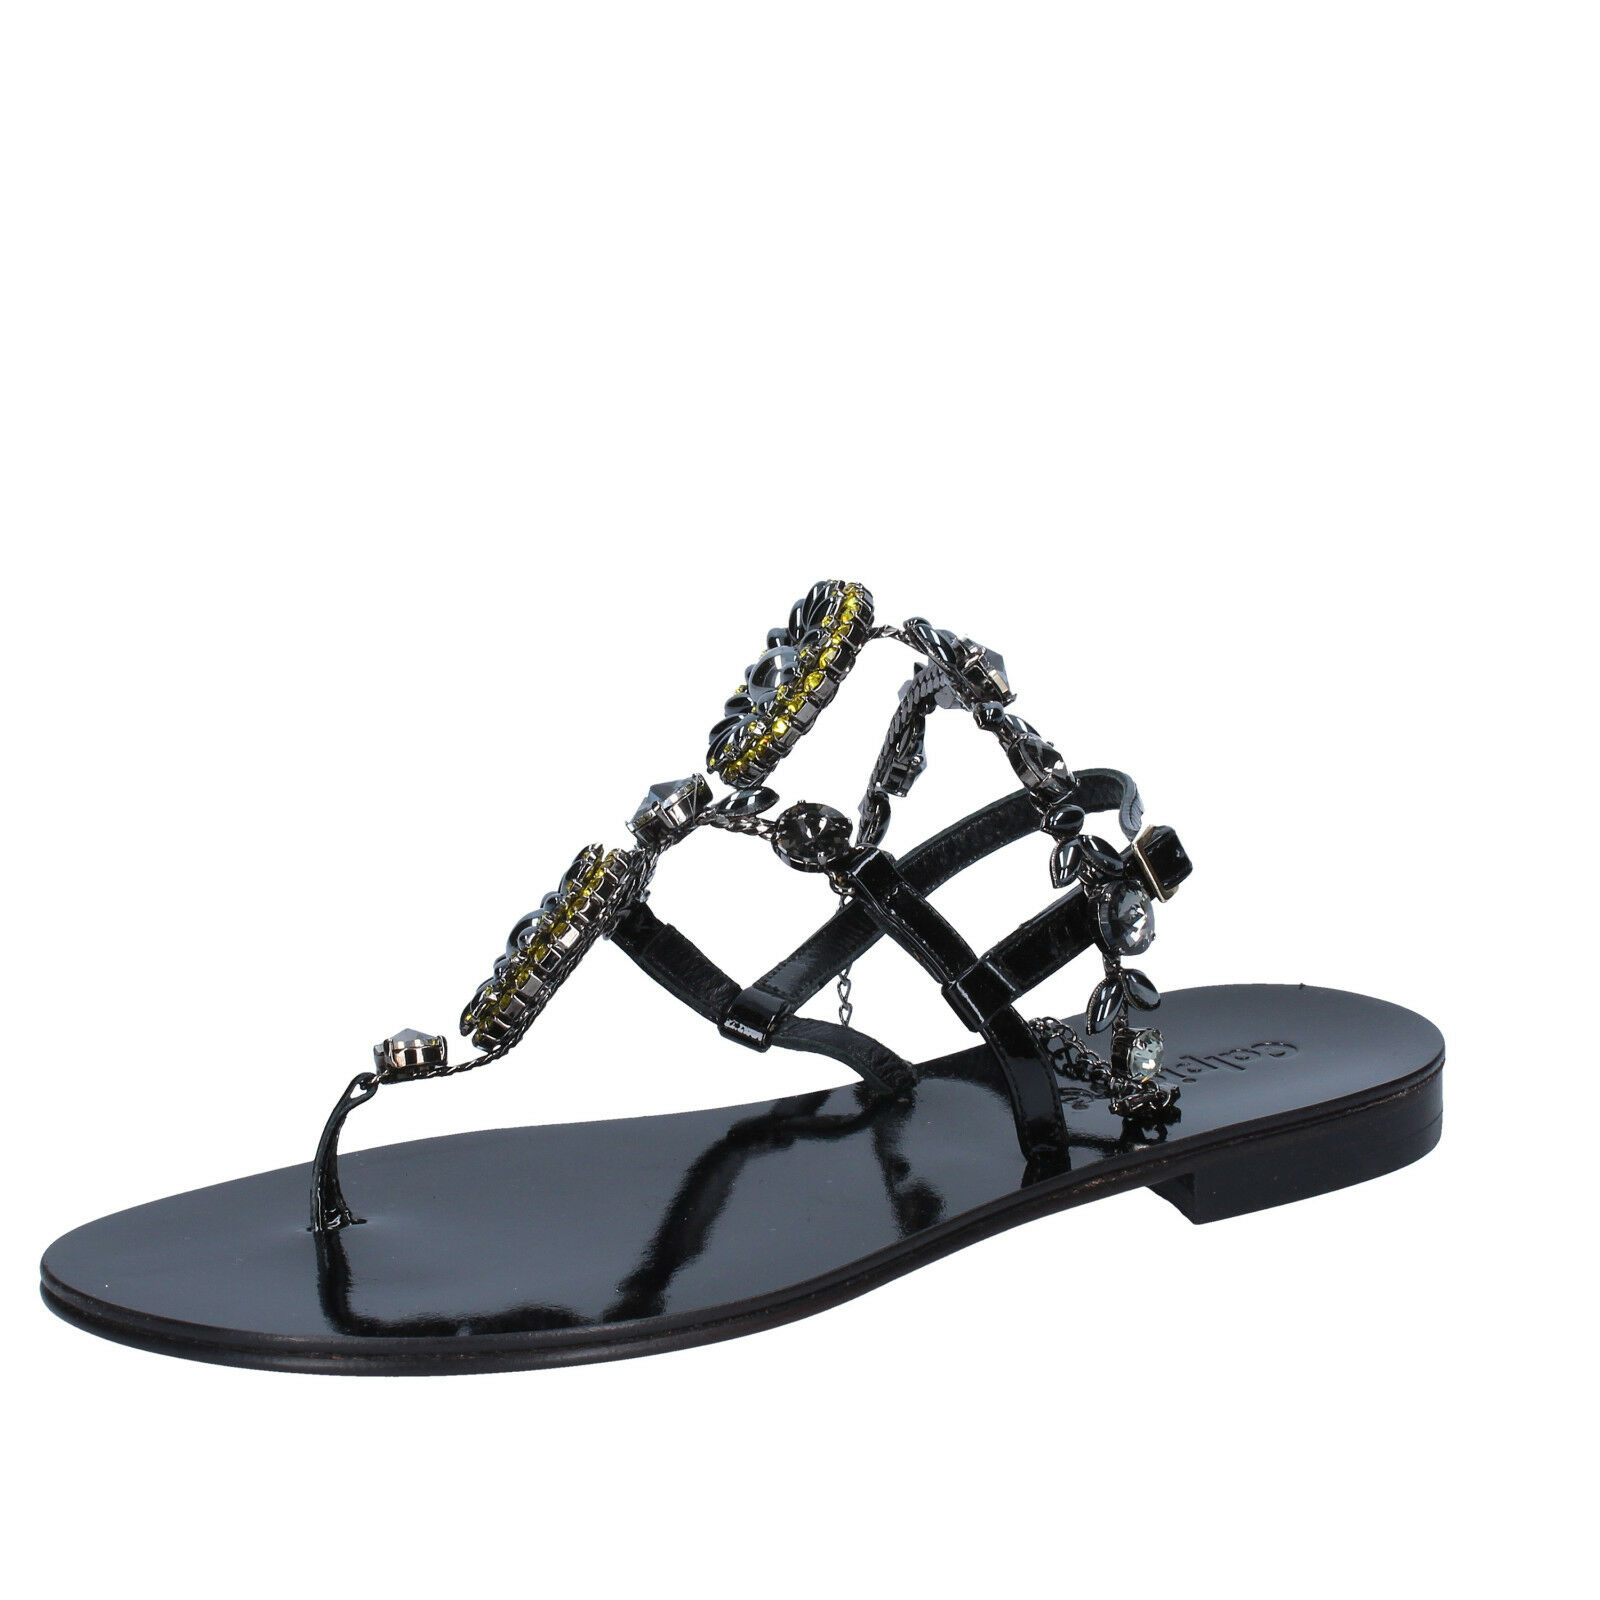 Scarpe donna CALPIERRE 38 EU sandali nero vernice BZ877-C